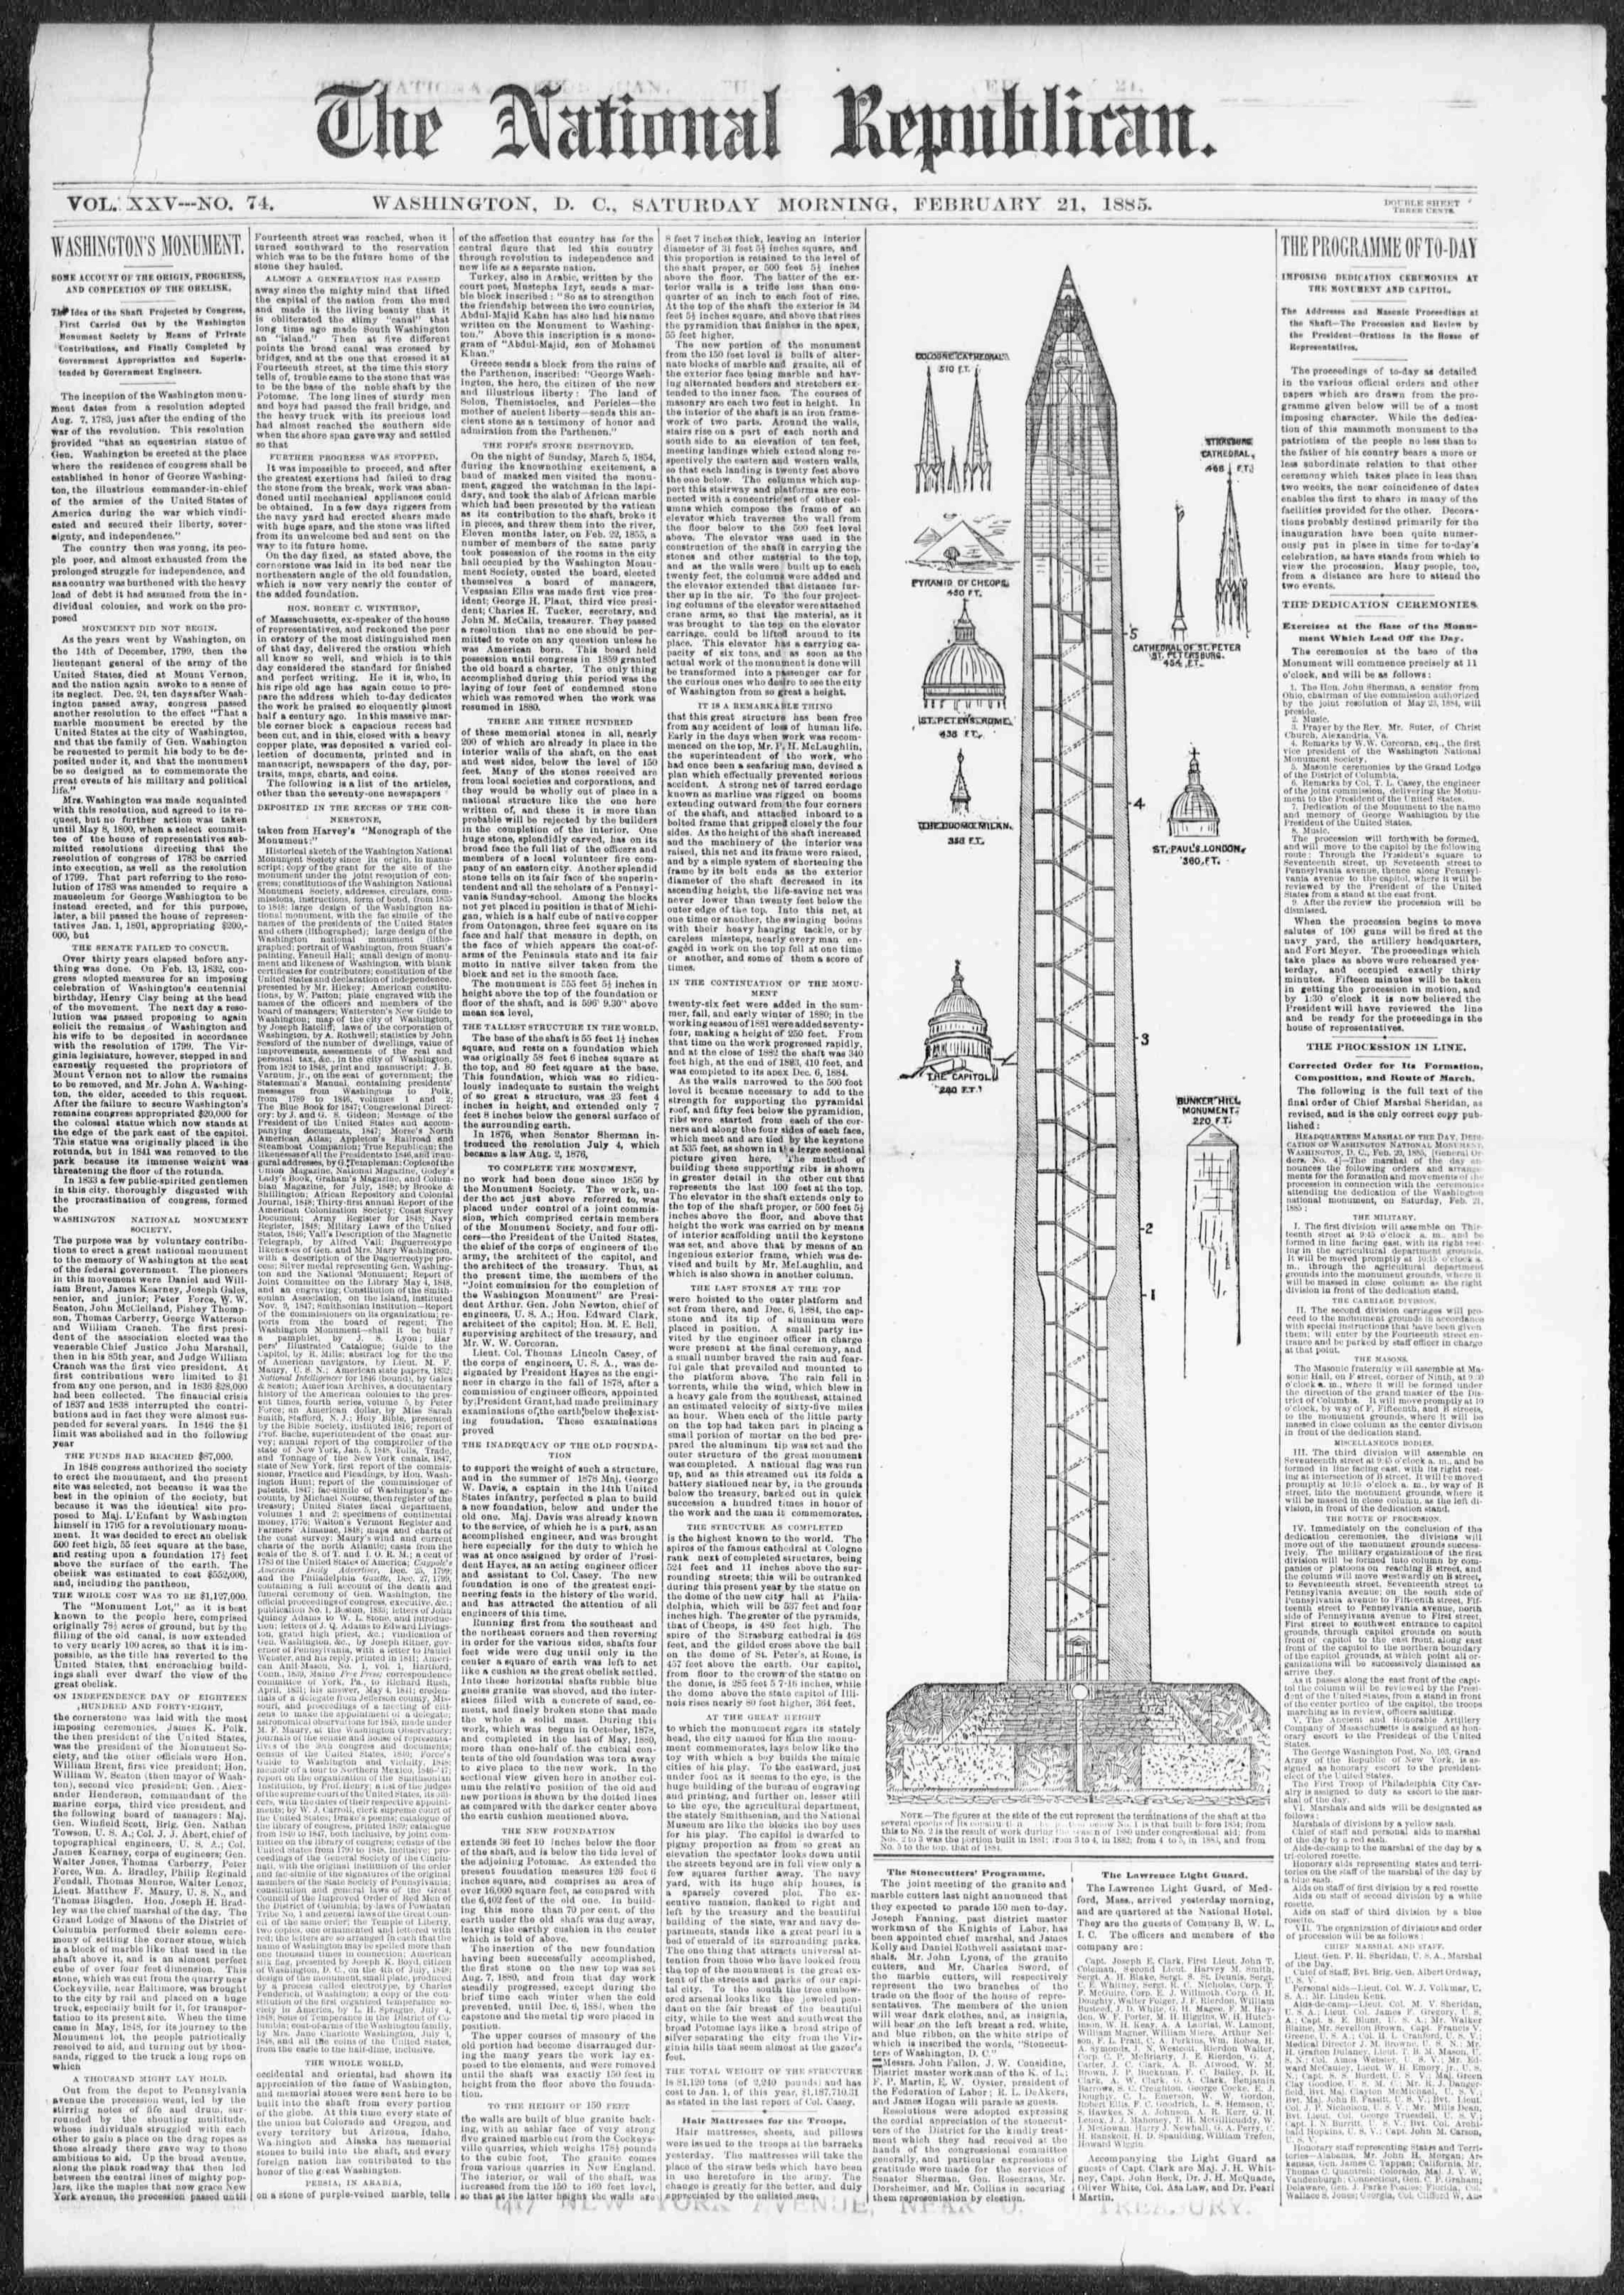 National Republican. (Washington City (D.C.)), Feb. 21, 1885.Front page news: Dedication of the Washington Monument.